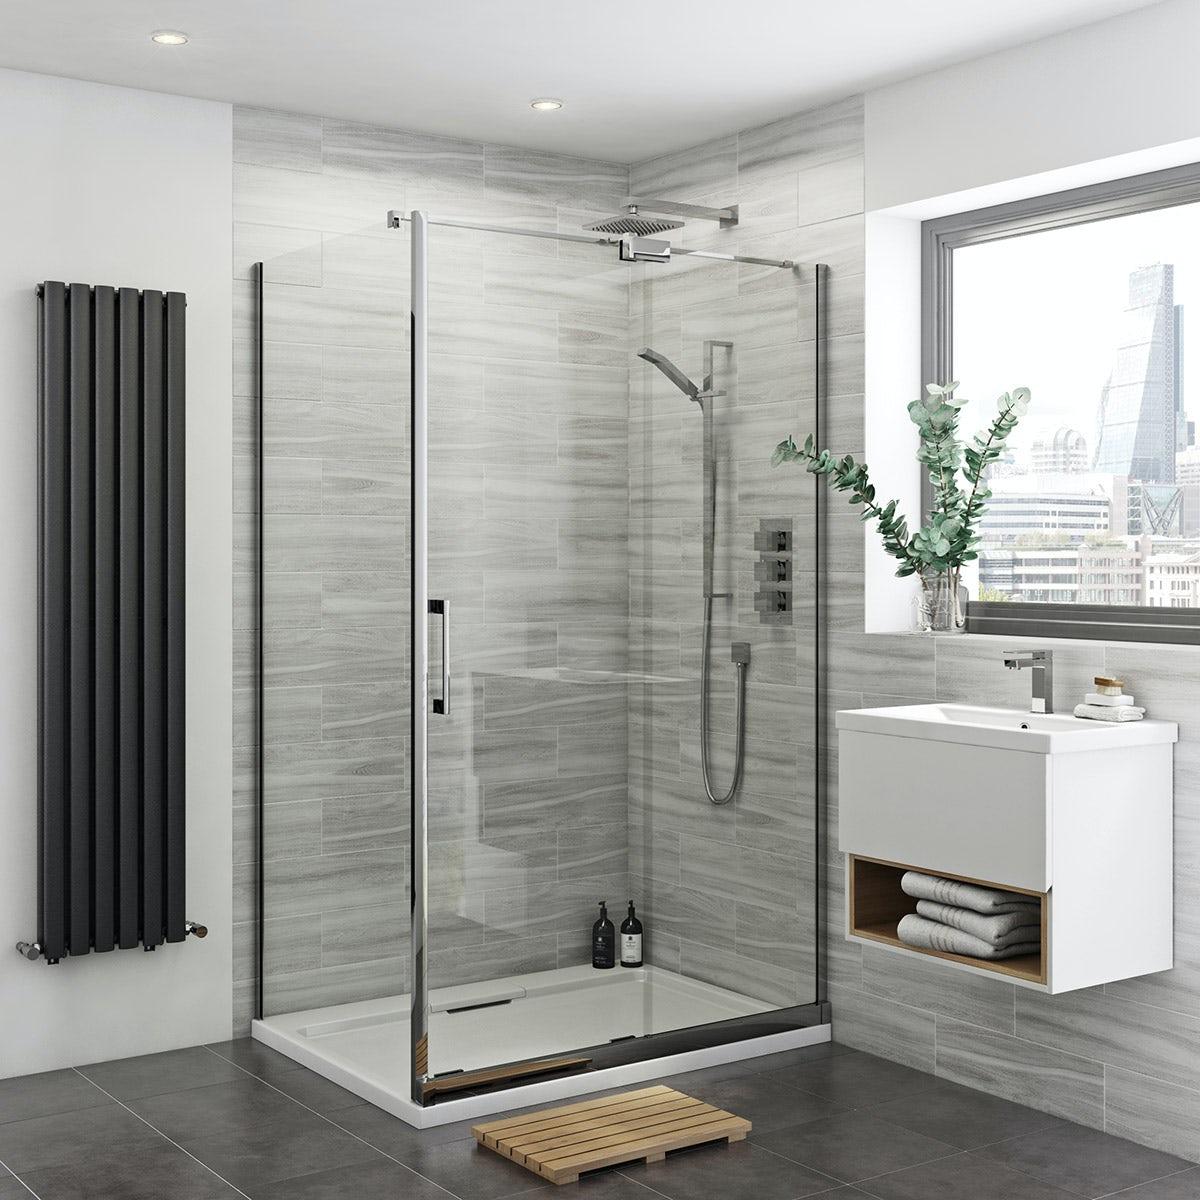 Carter 8mm easy clean right handed sliding shower enclosure